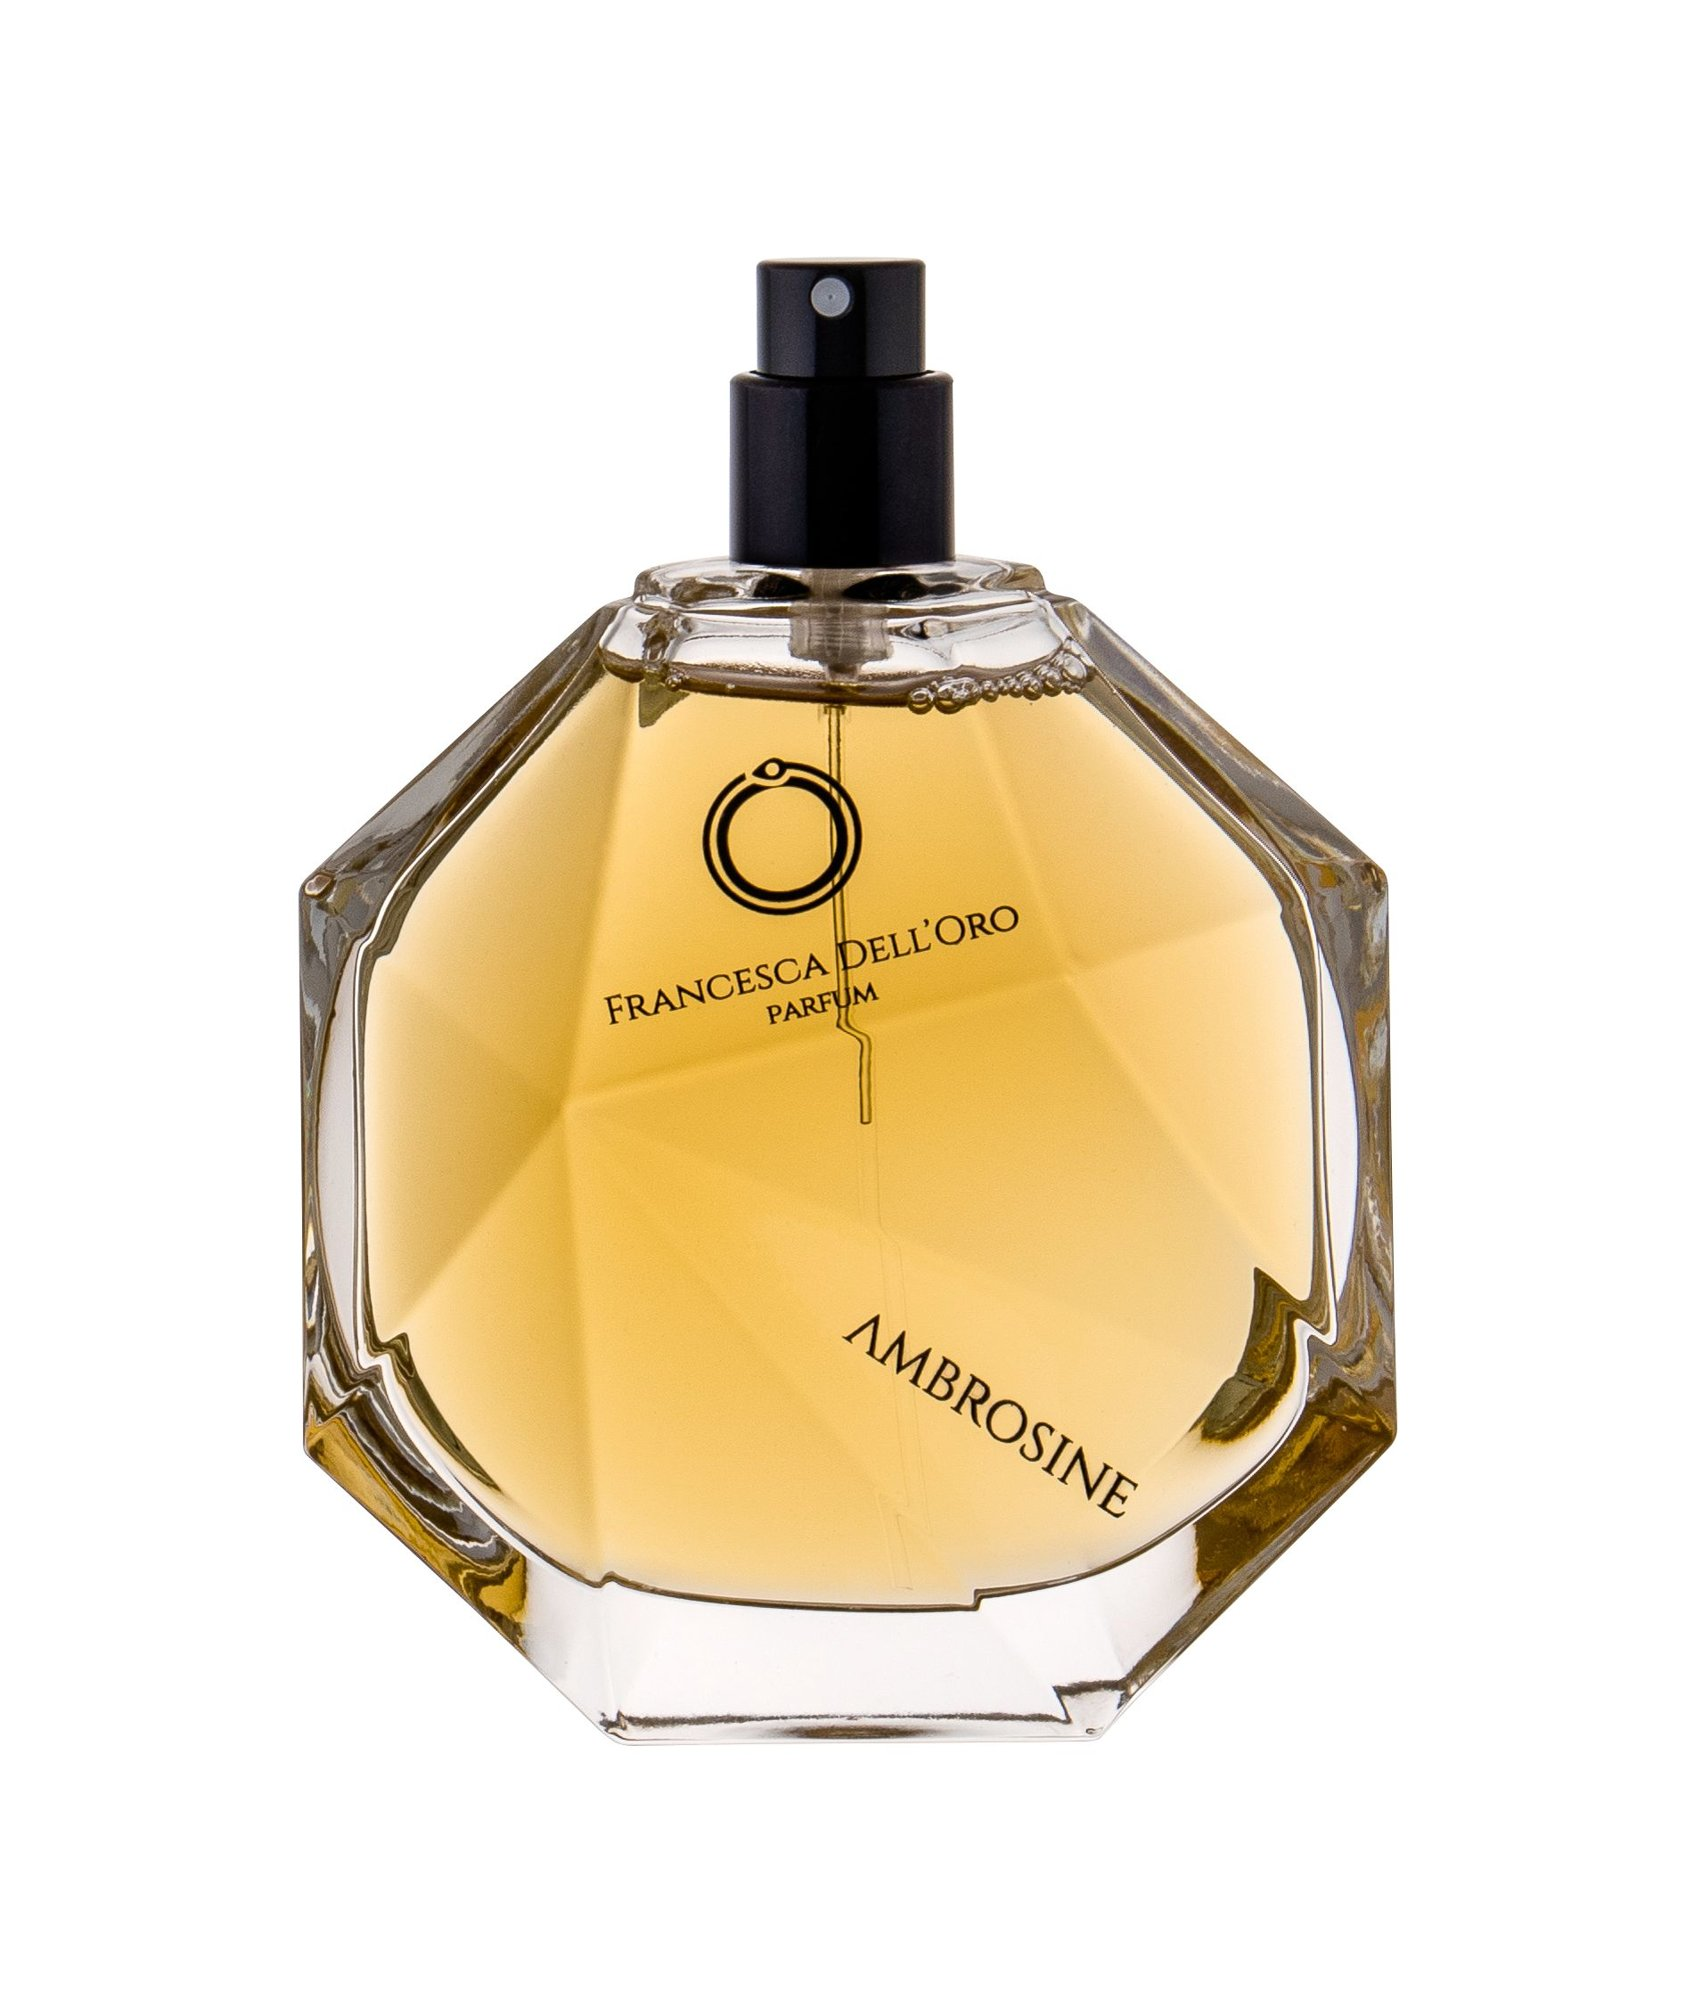 Francesca dell´Oro Ambrosine Eau de Parfum 100ml